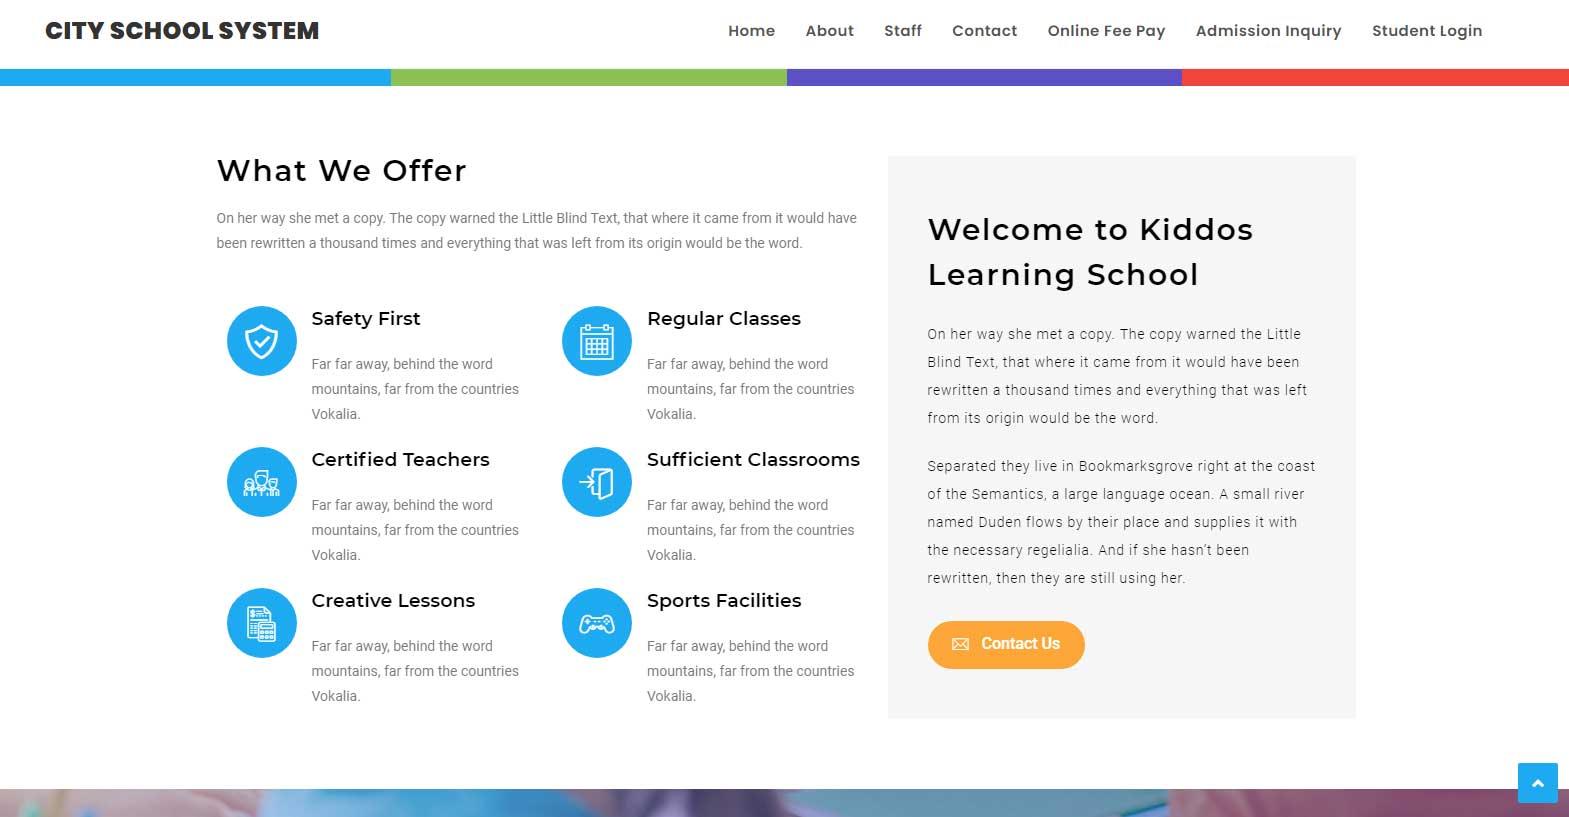 City-School-System-offer